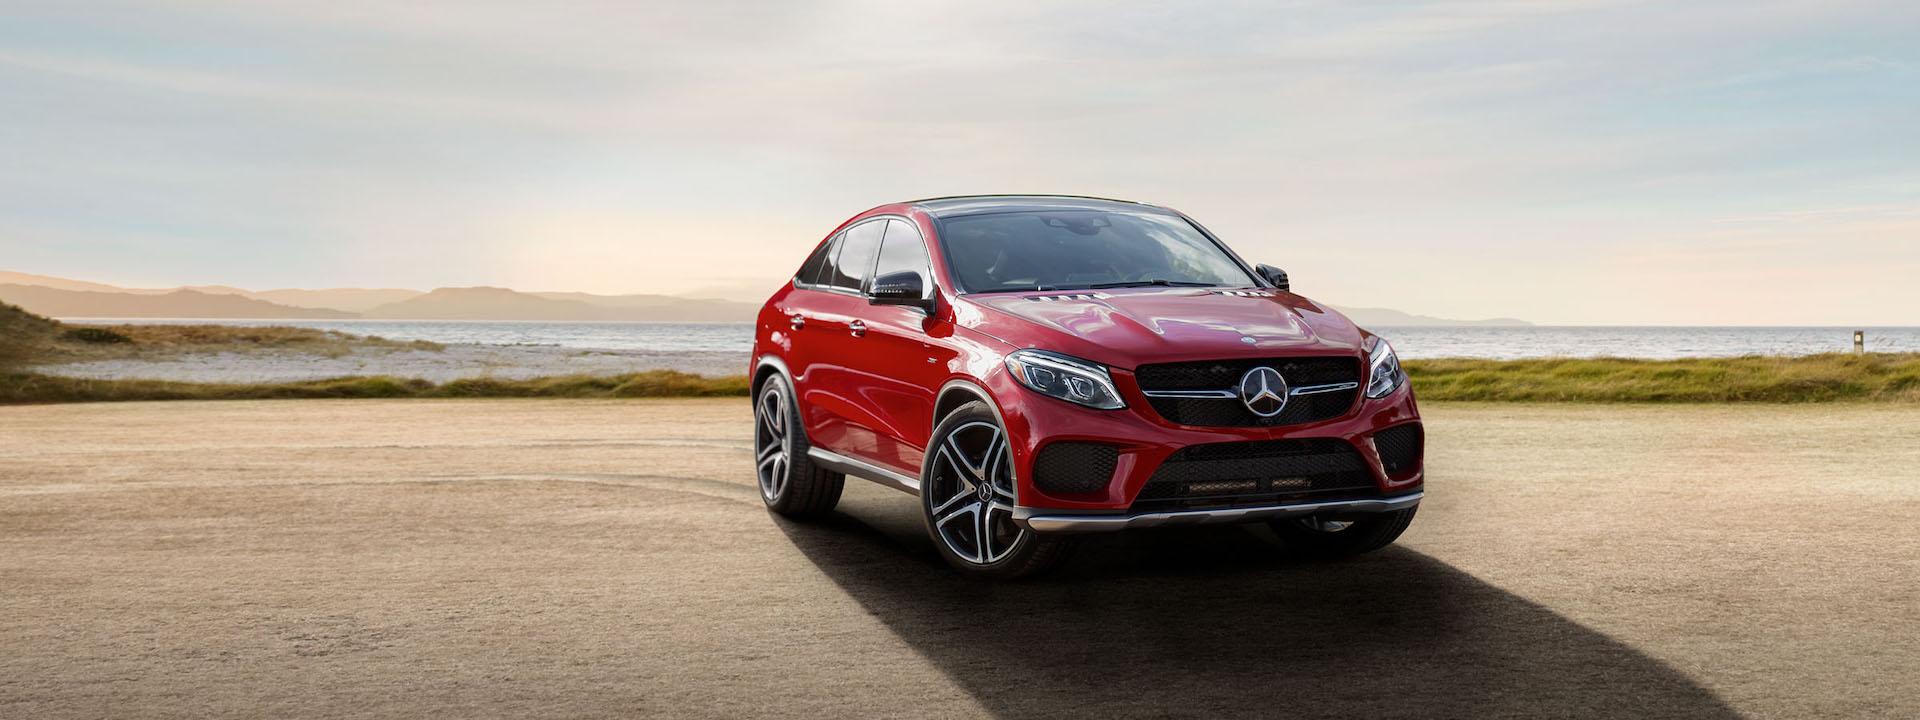 2020 Mercedes-Benz GLE Coupe | Mercedes-Benz of Fort Walton Beach